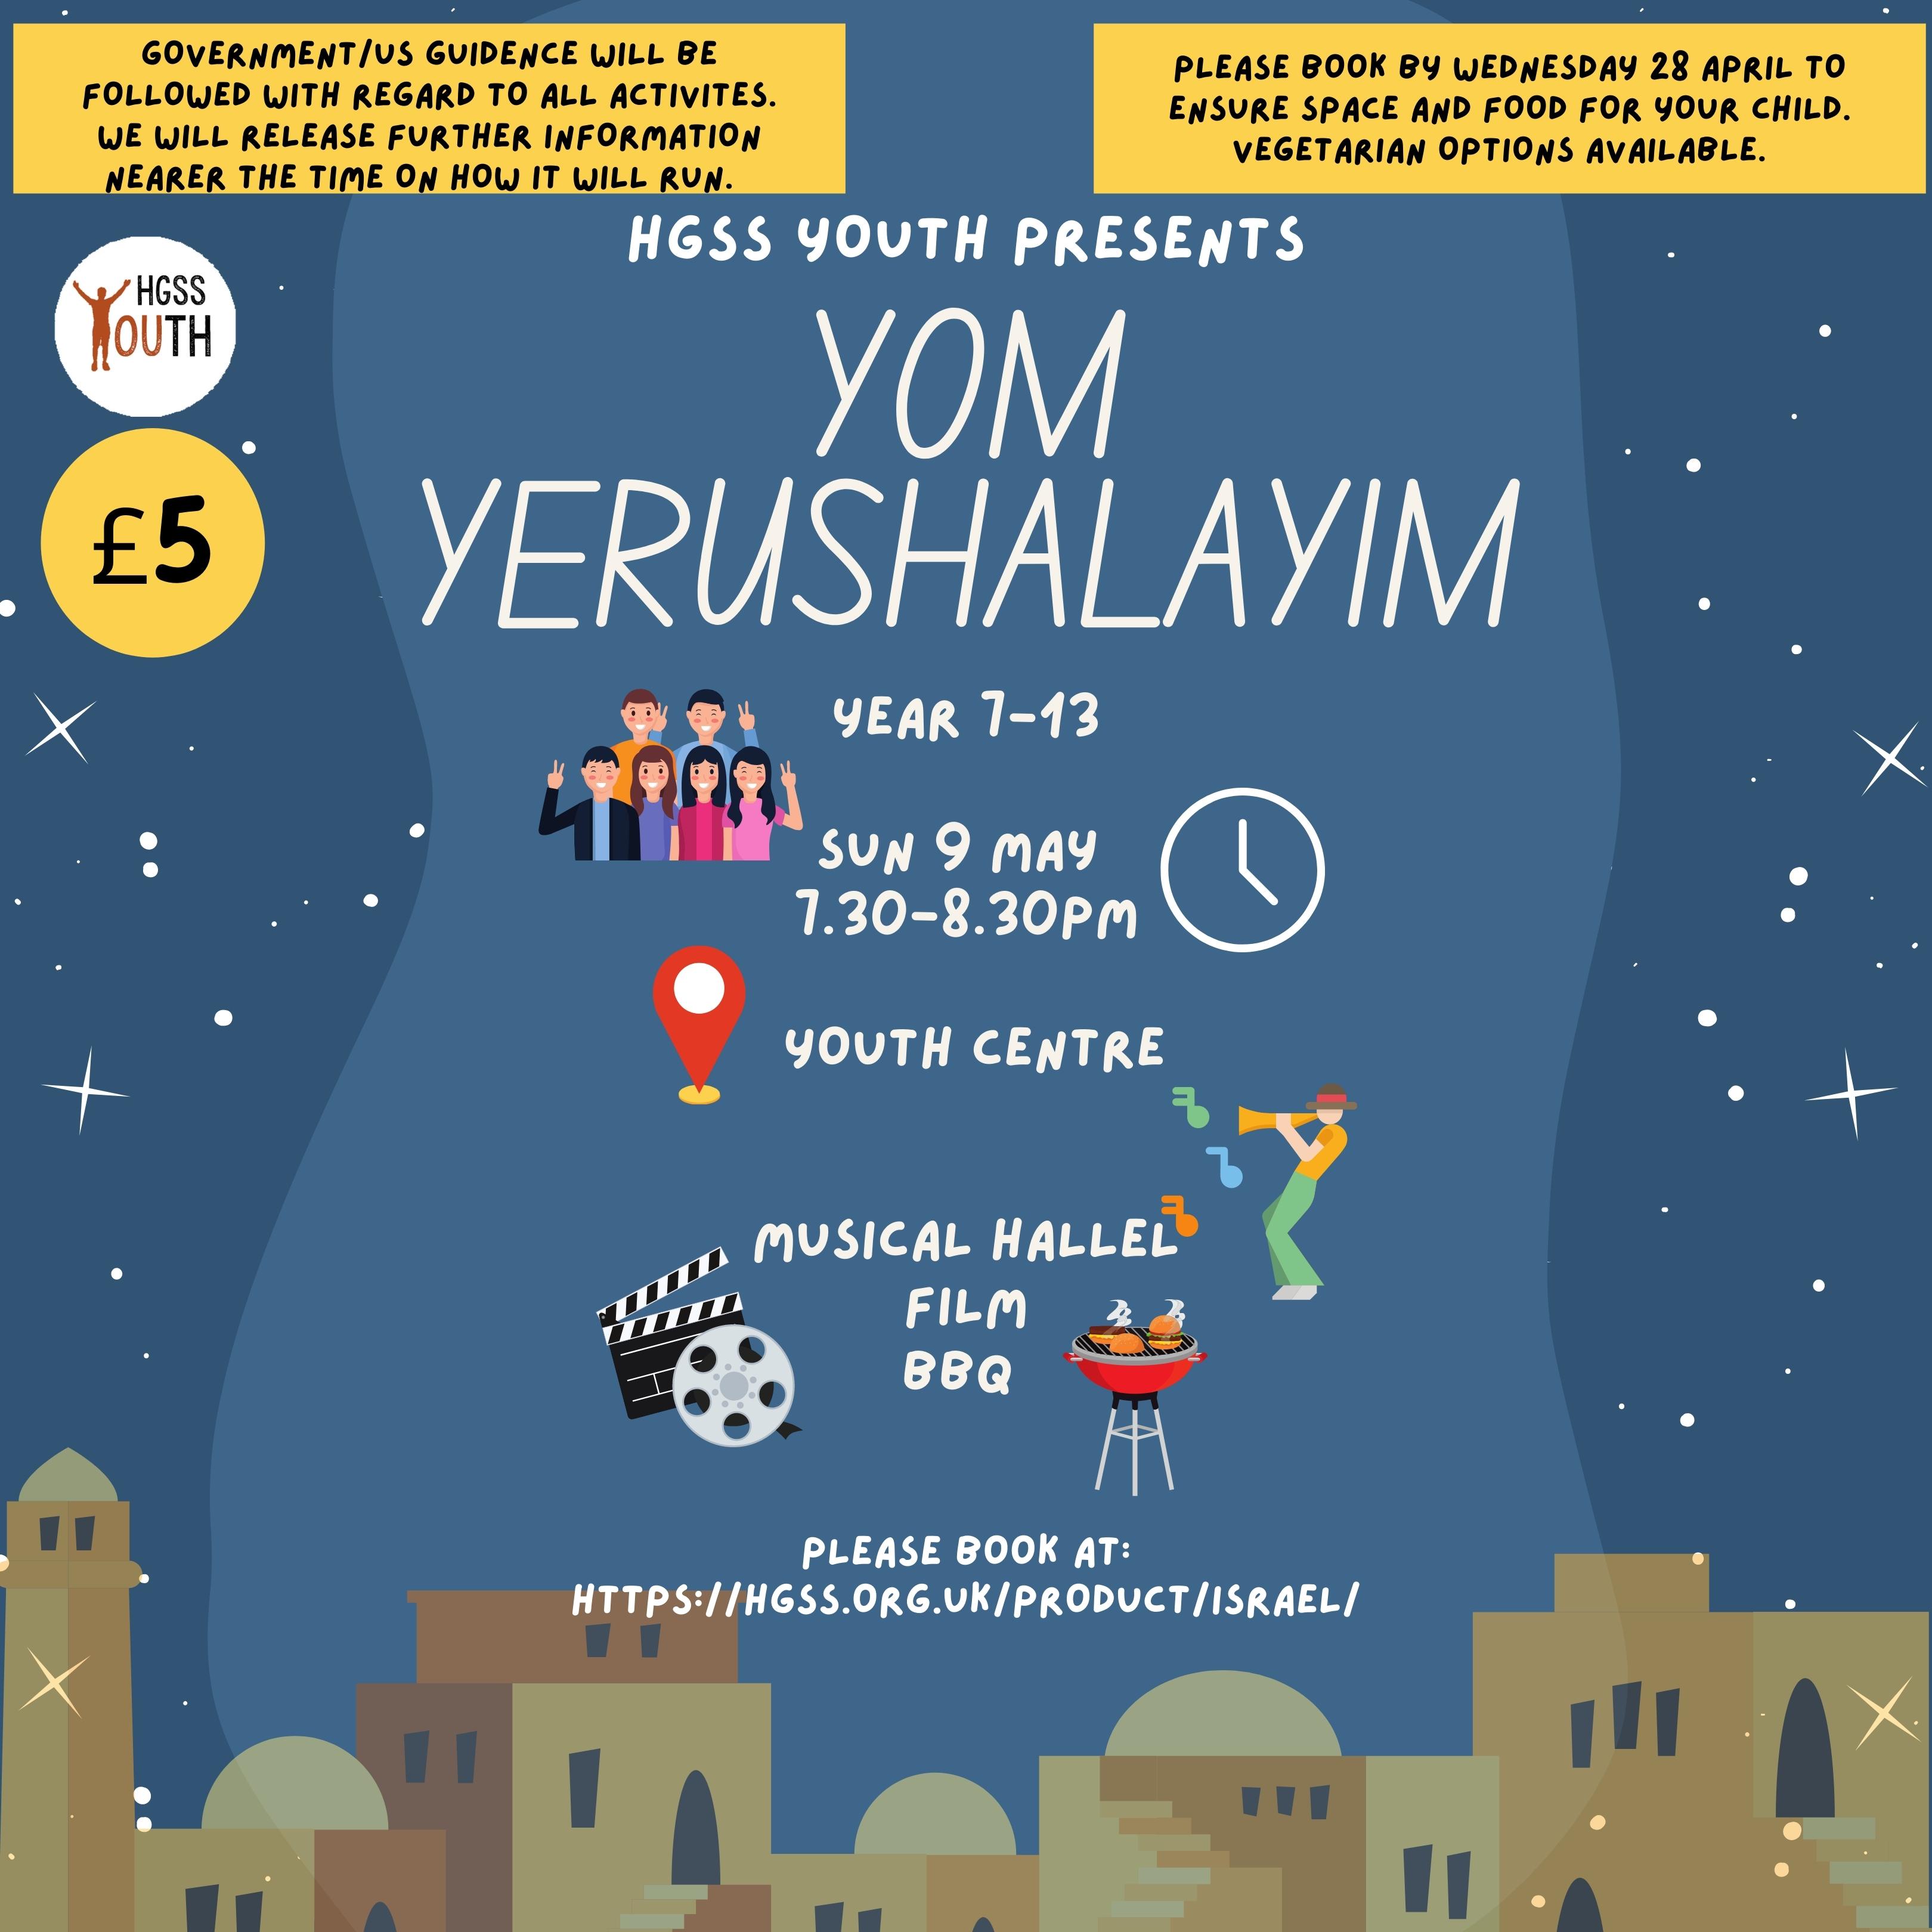 Youth Yom Yerushalayim @ HGSS